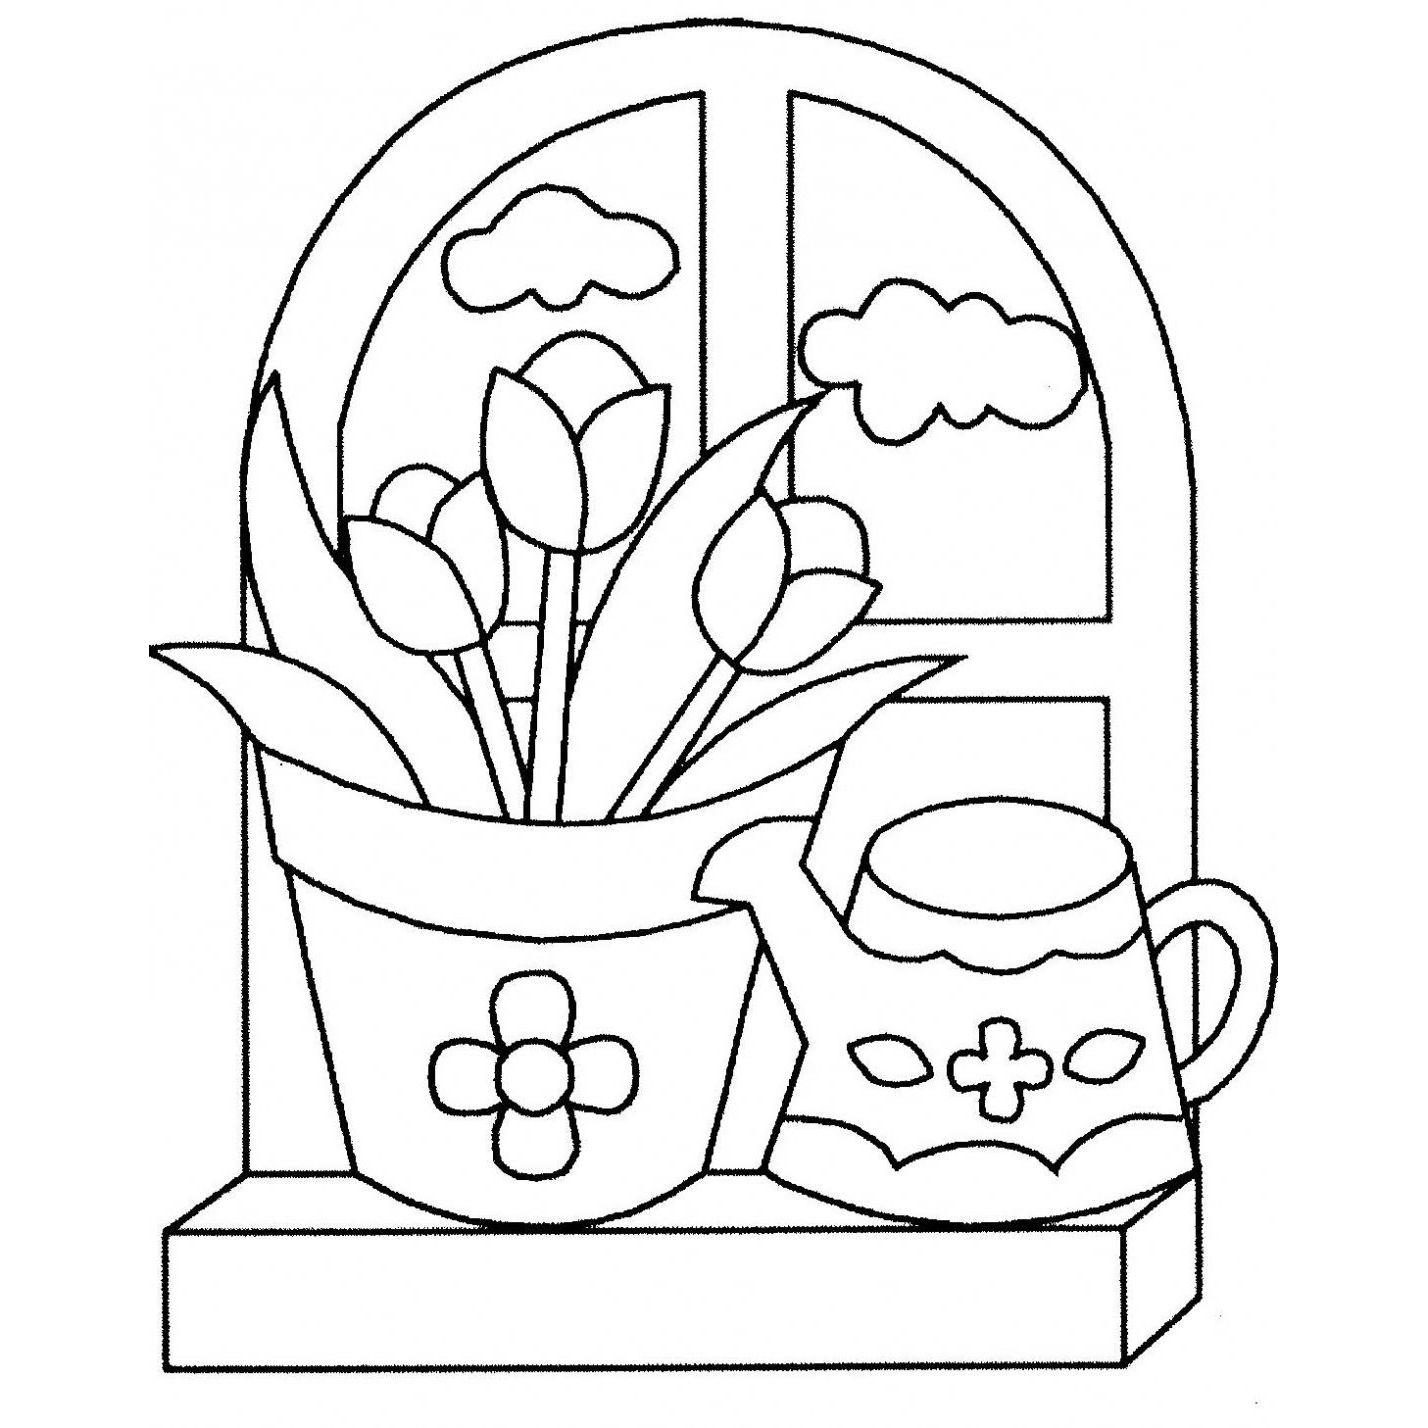 plantillas de flores para pintar en tela | DIBUJOS PARA ...